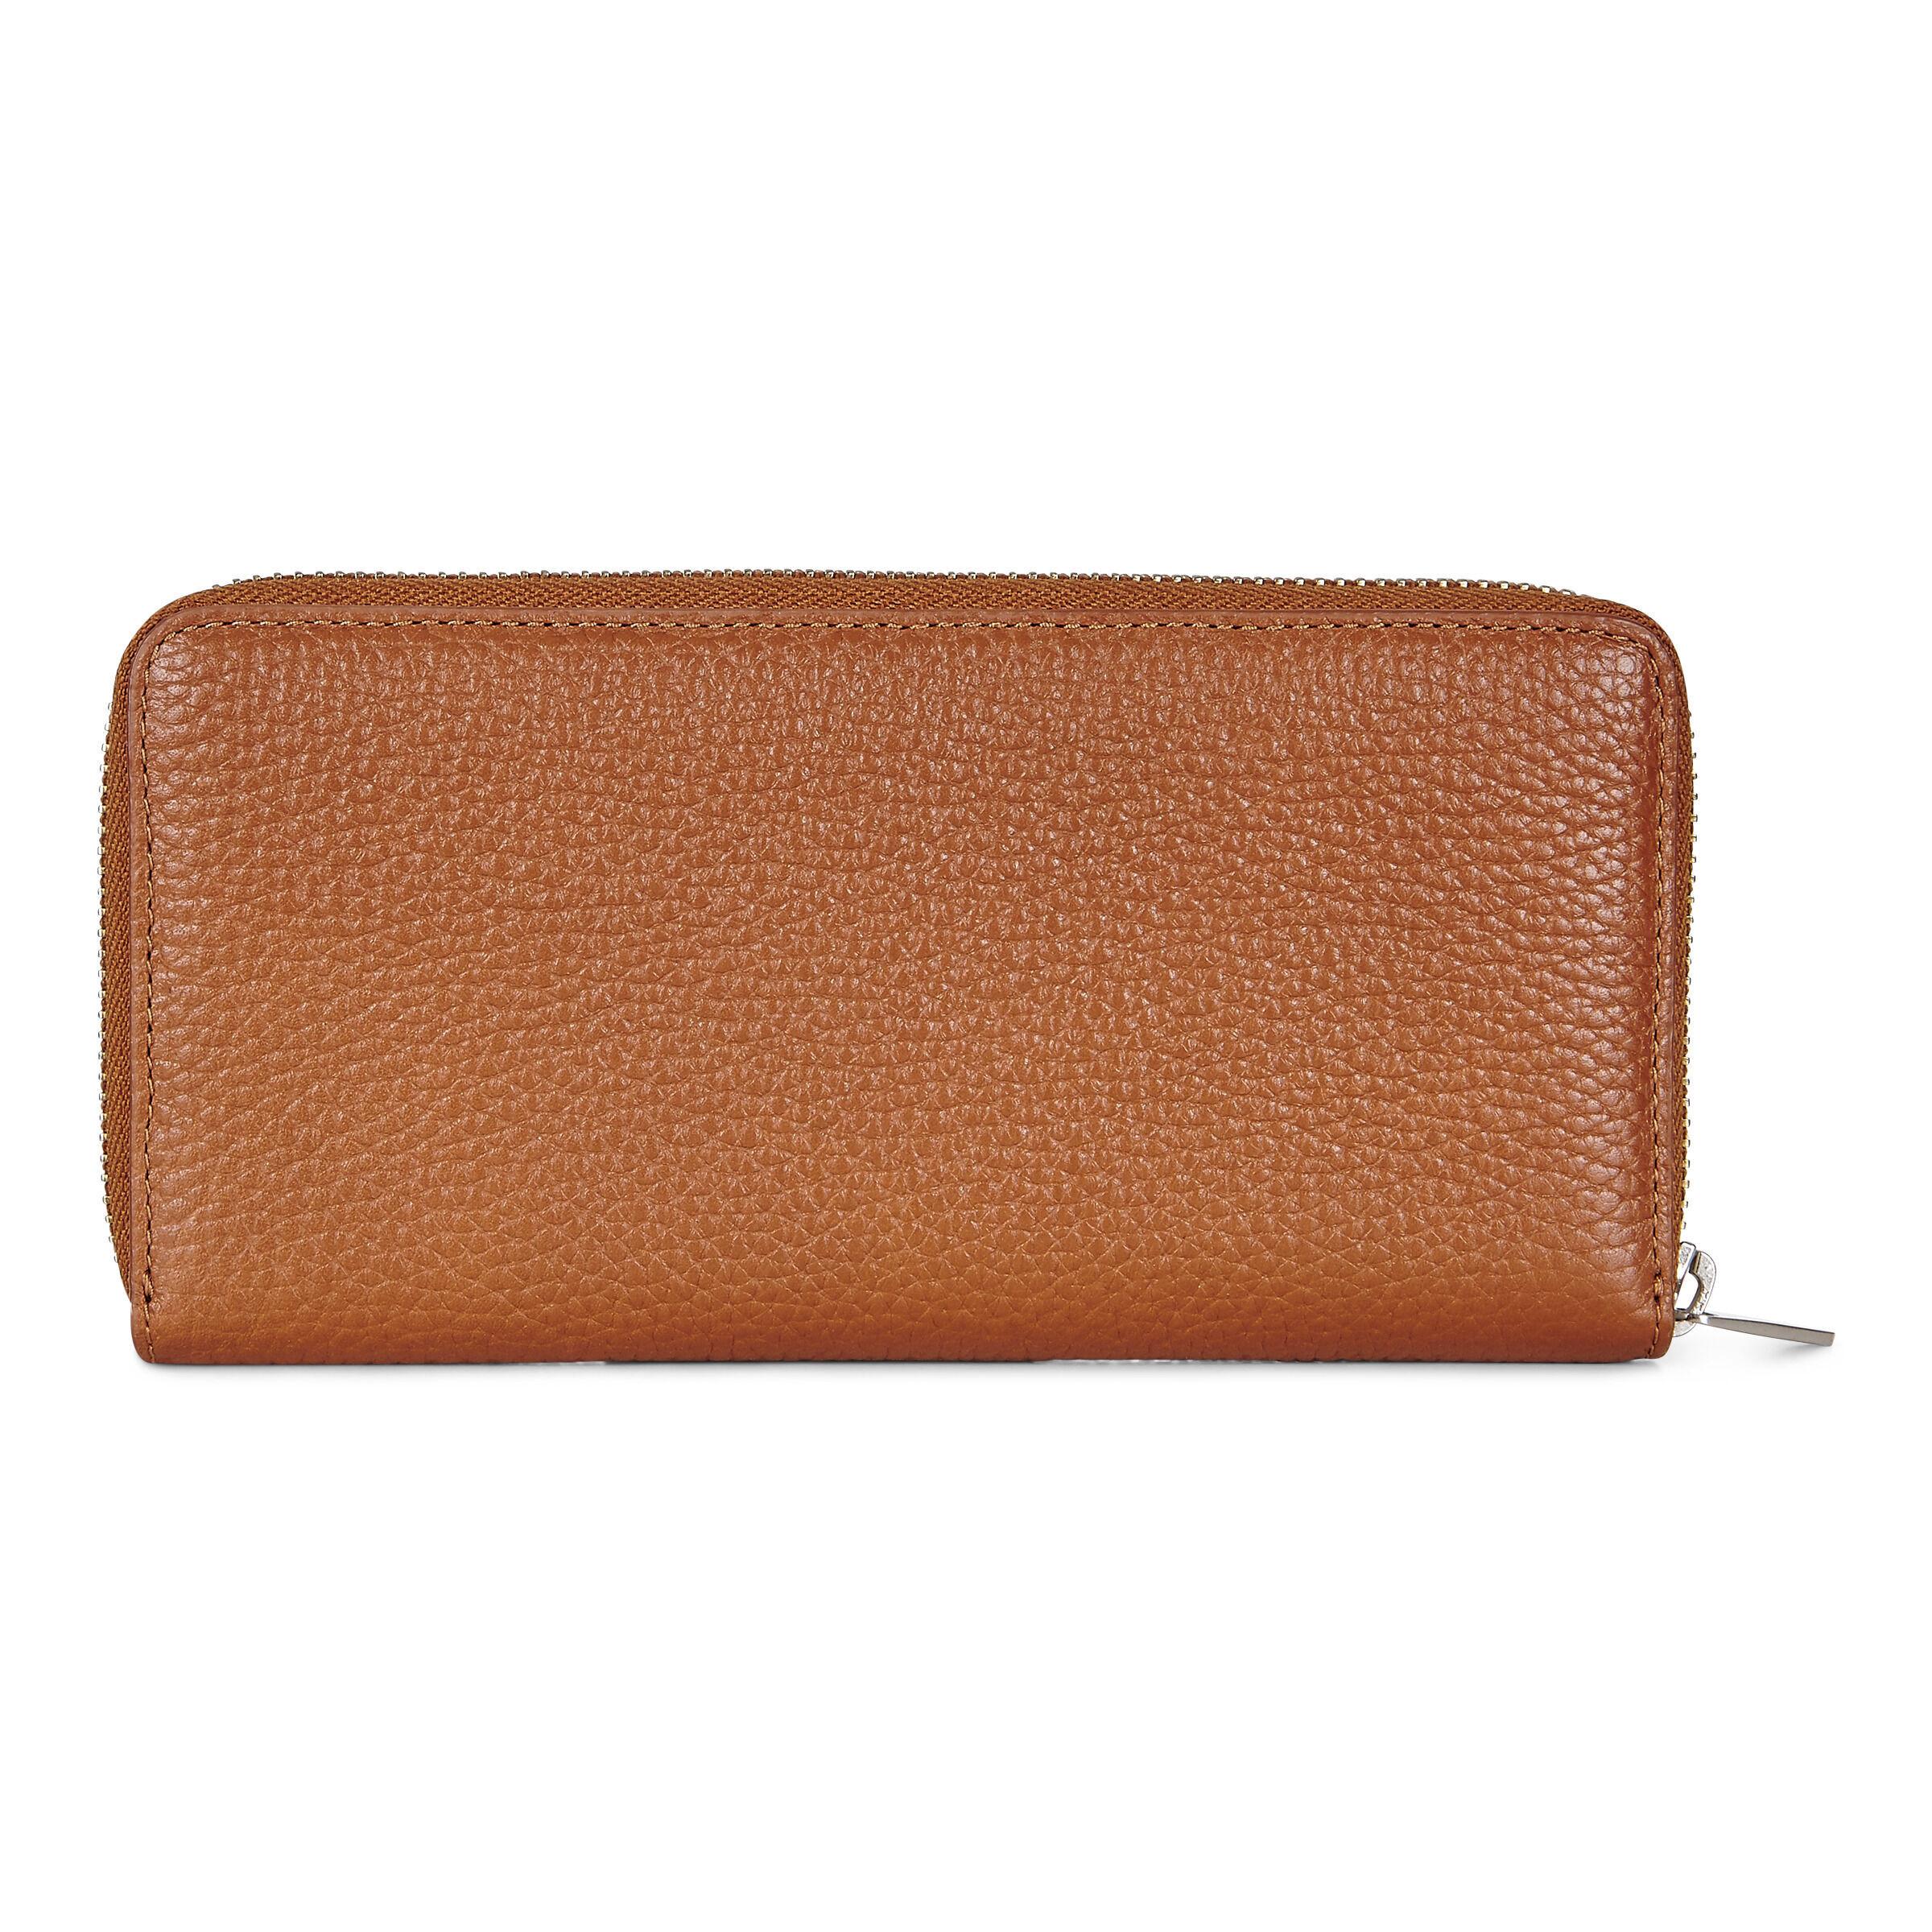 ECCO Isan 2 Large Zip Wallet: One Size - Caramel